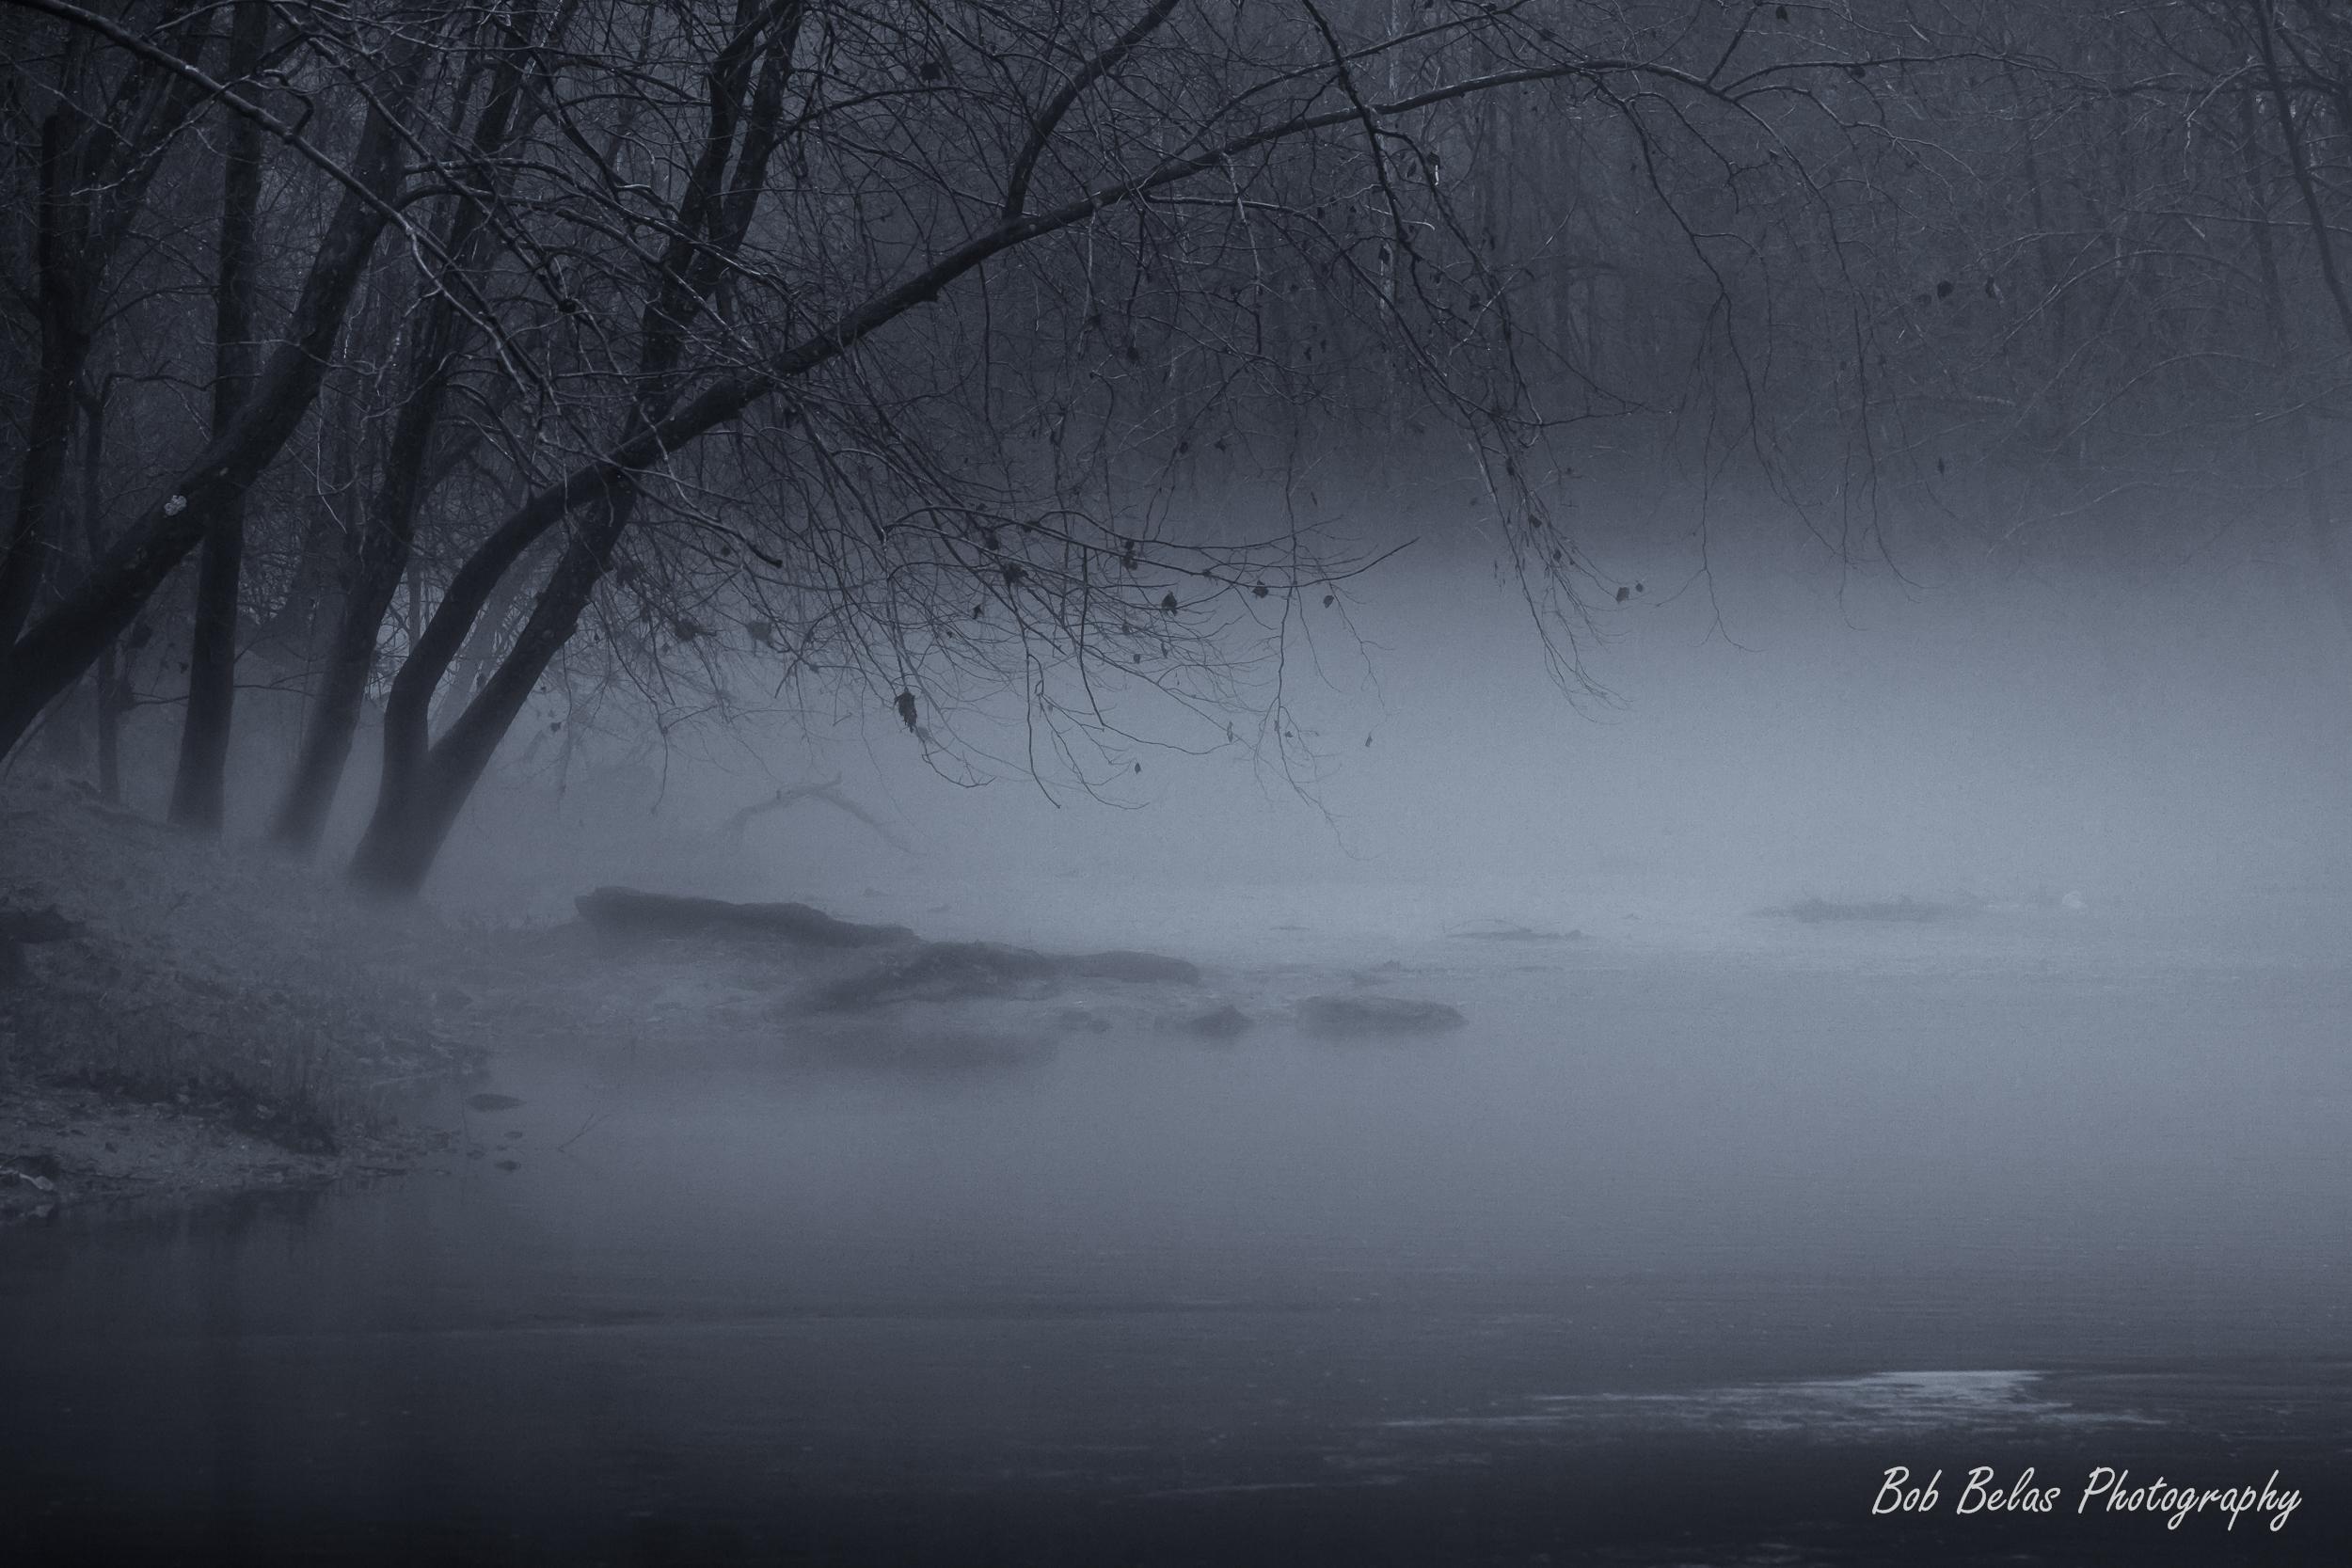 River Fog #2, toned monochrome